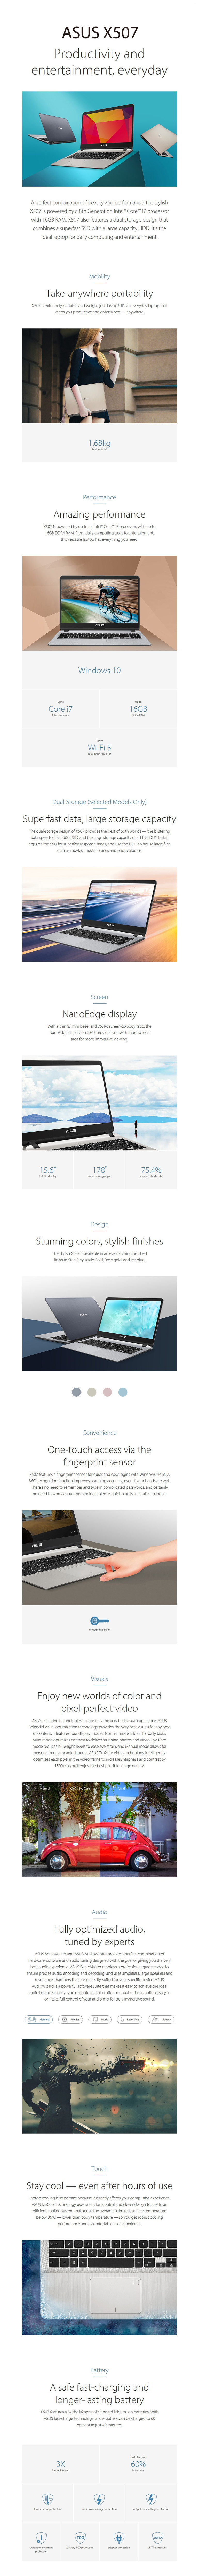 "ASUS X507UA 15.6"" Notebook i7-8550U 8GB 512GB SSD Win10H - Star Gray - Desktop Overview 1"